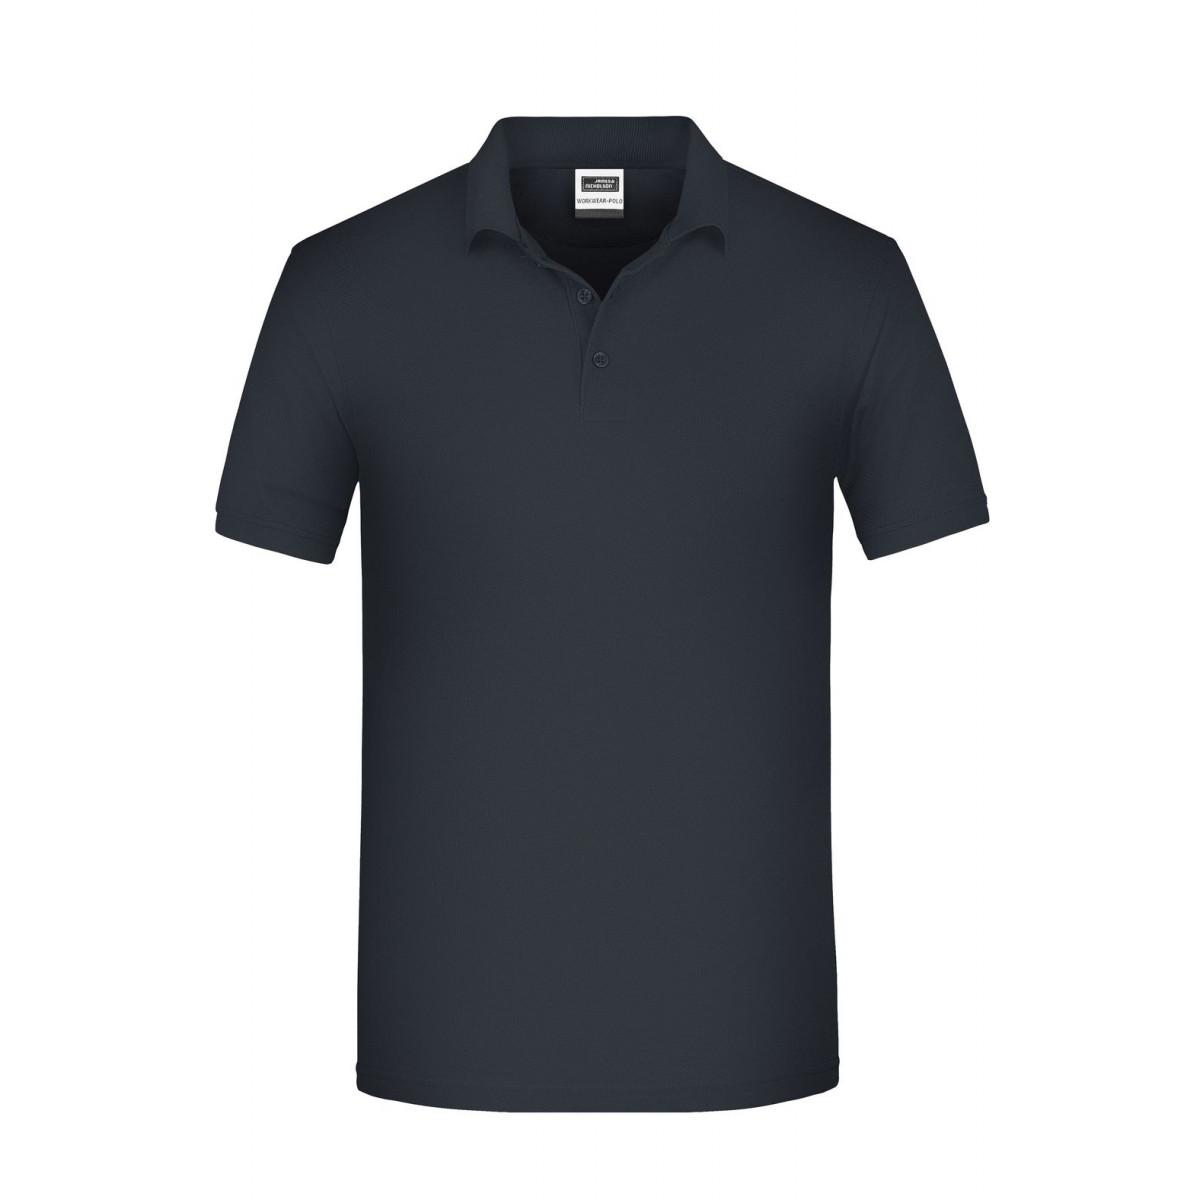 Рубашка поло мужская JN874 Mens BIO Workwear Polo - Карбон